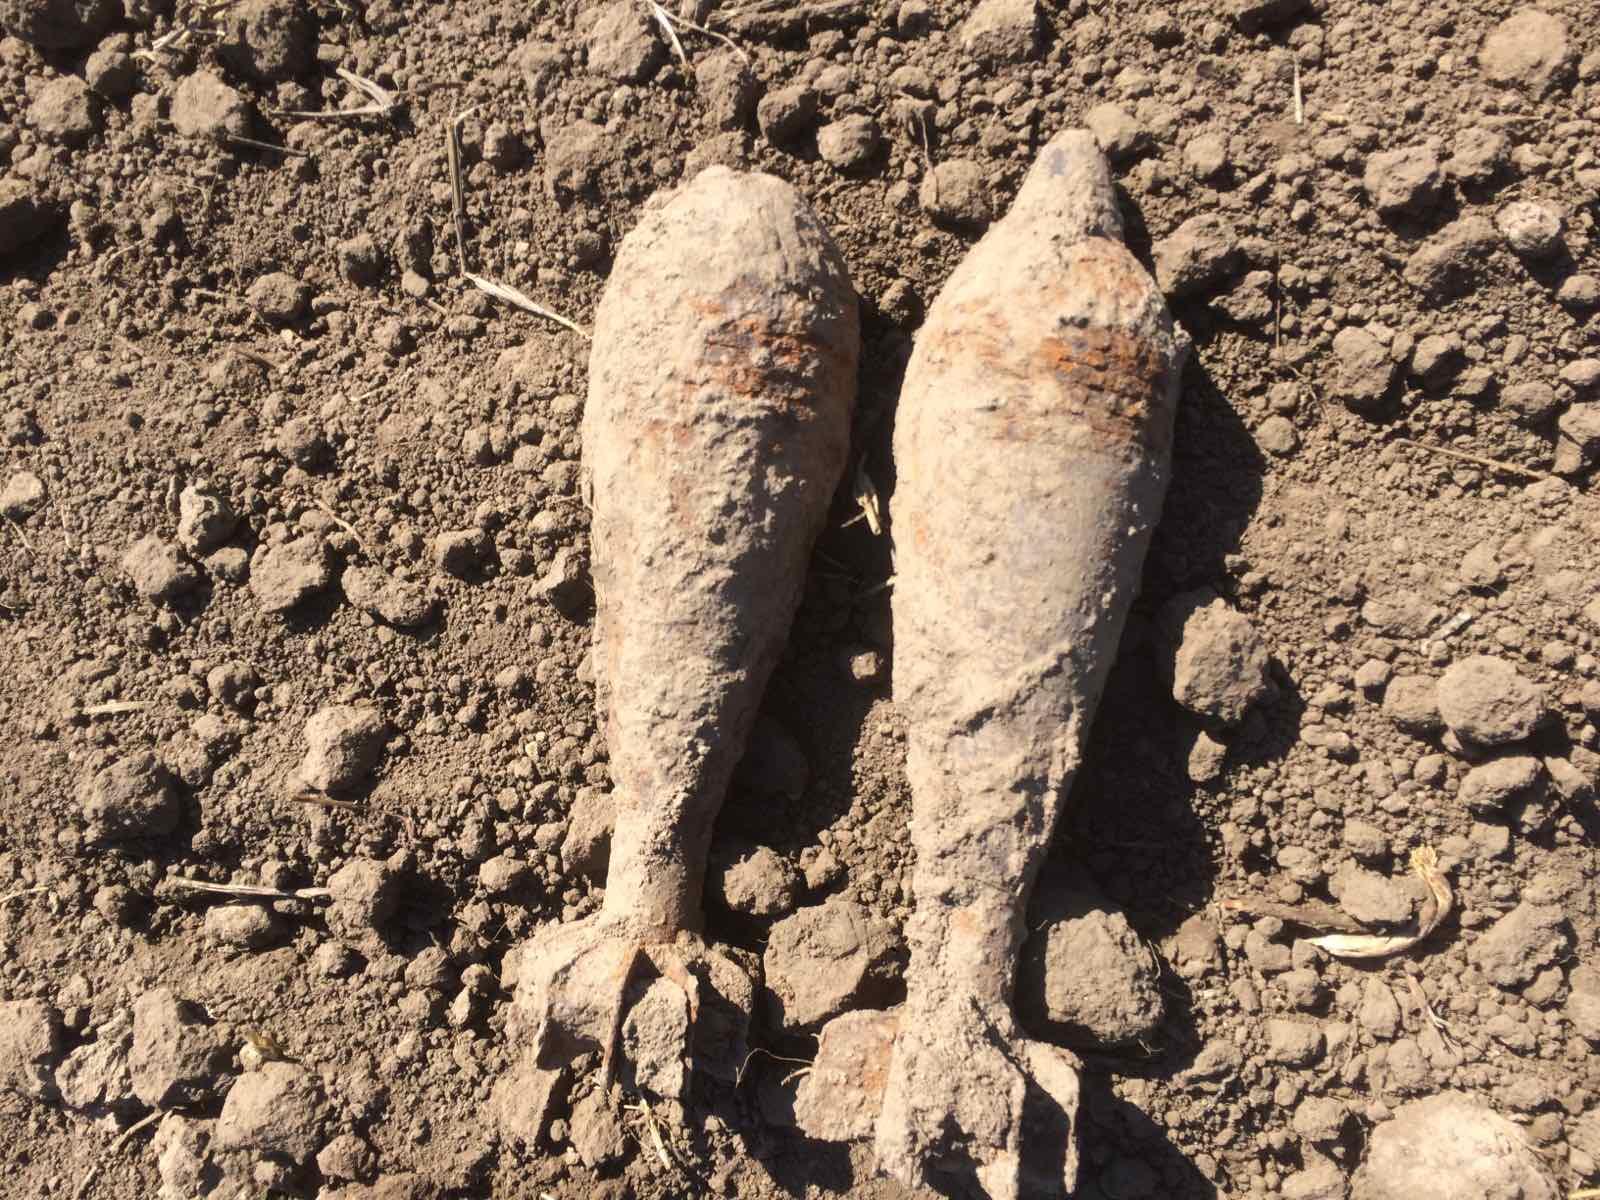 На Київщині виявлено і знищено 11 мін та снарядів -  - IMG 6ebe251b8a9157da09a144a2eade868a V